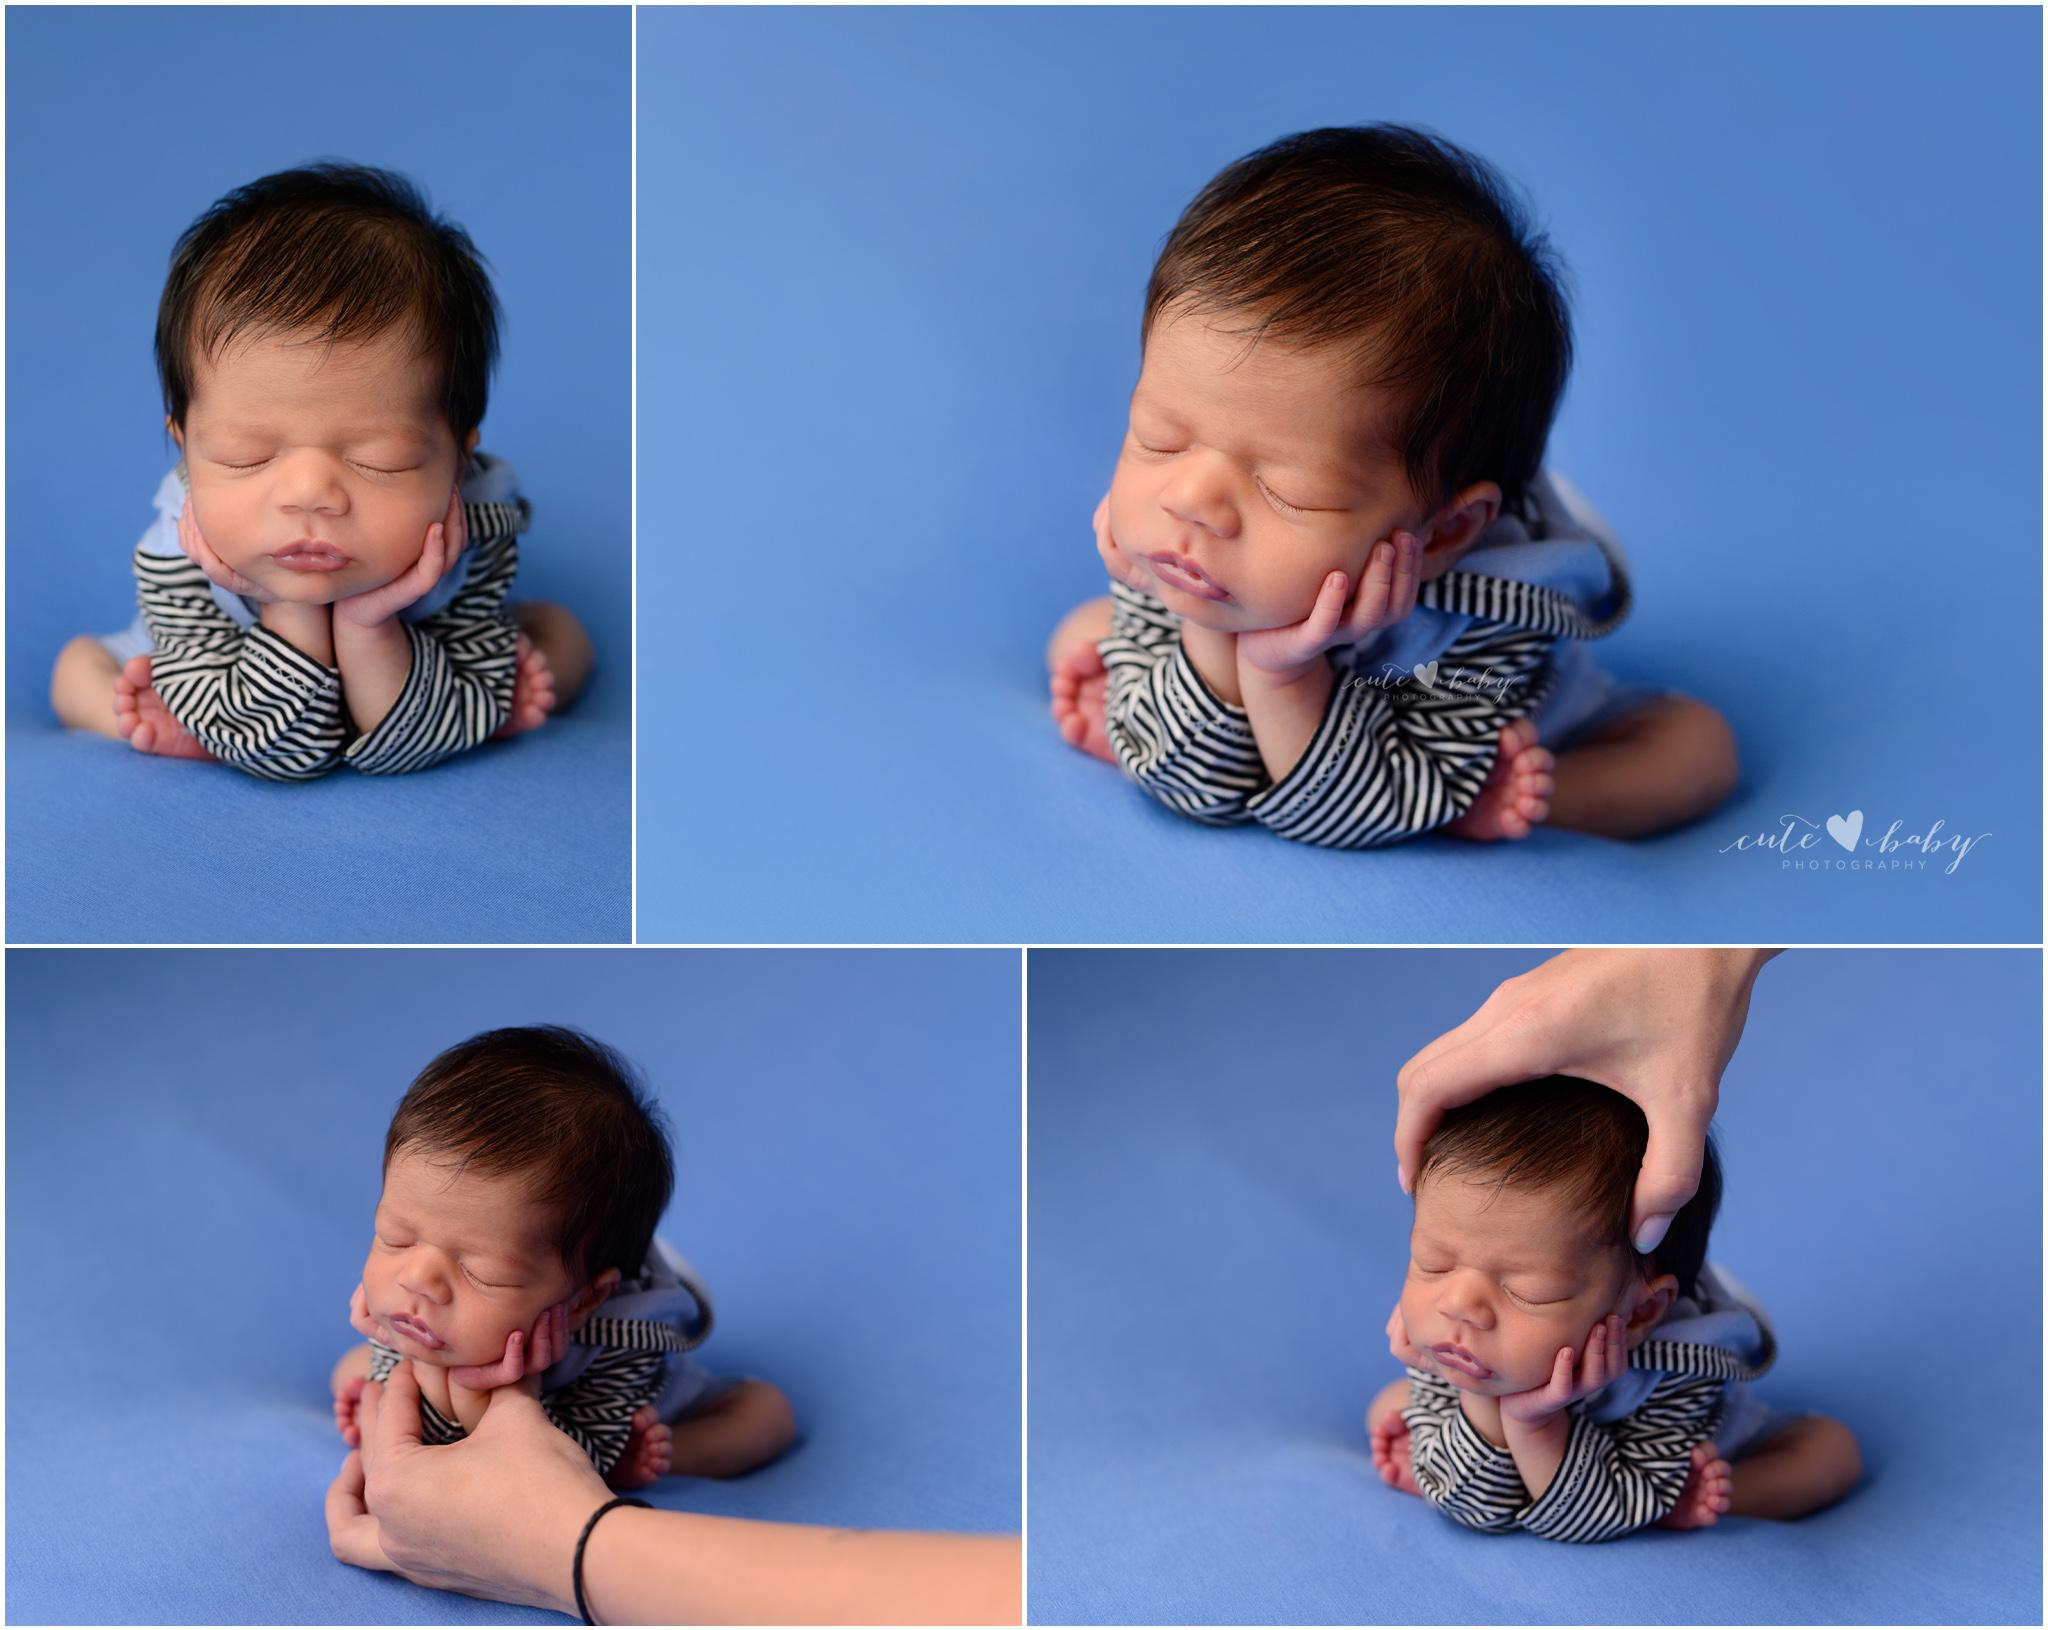 Newborn Photography Manchester, Newborn Pictures Cheshire, Newborn Safety Cute Baby Photography